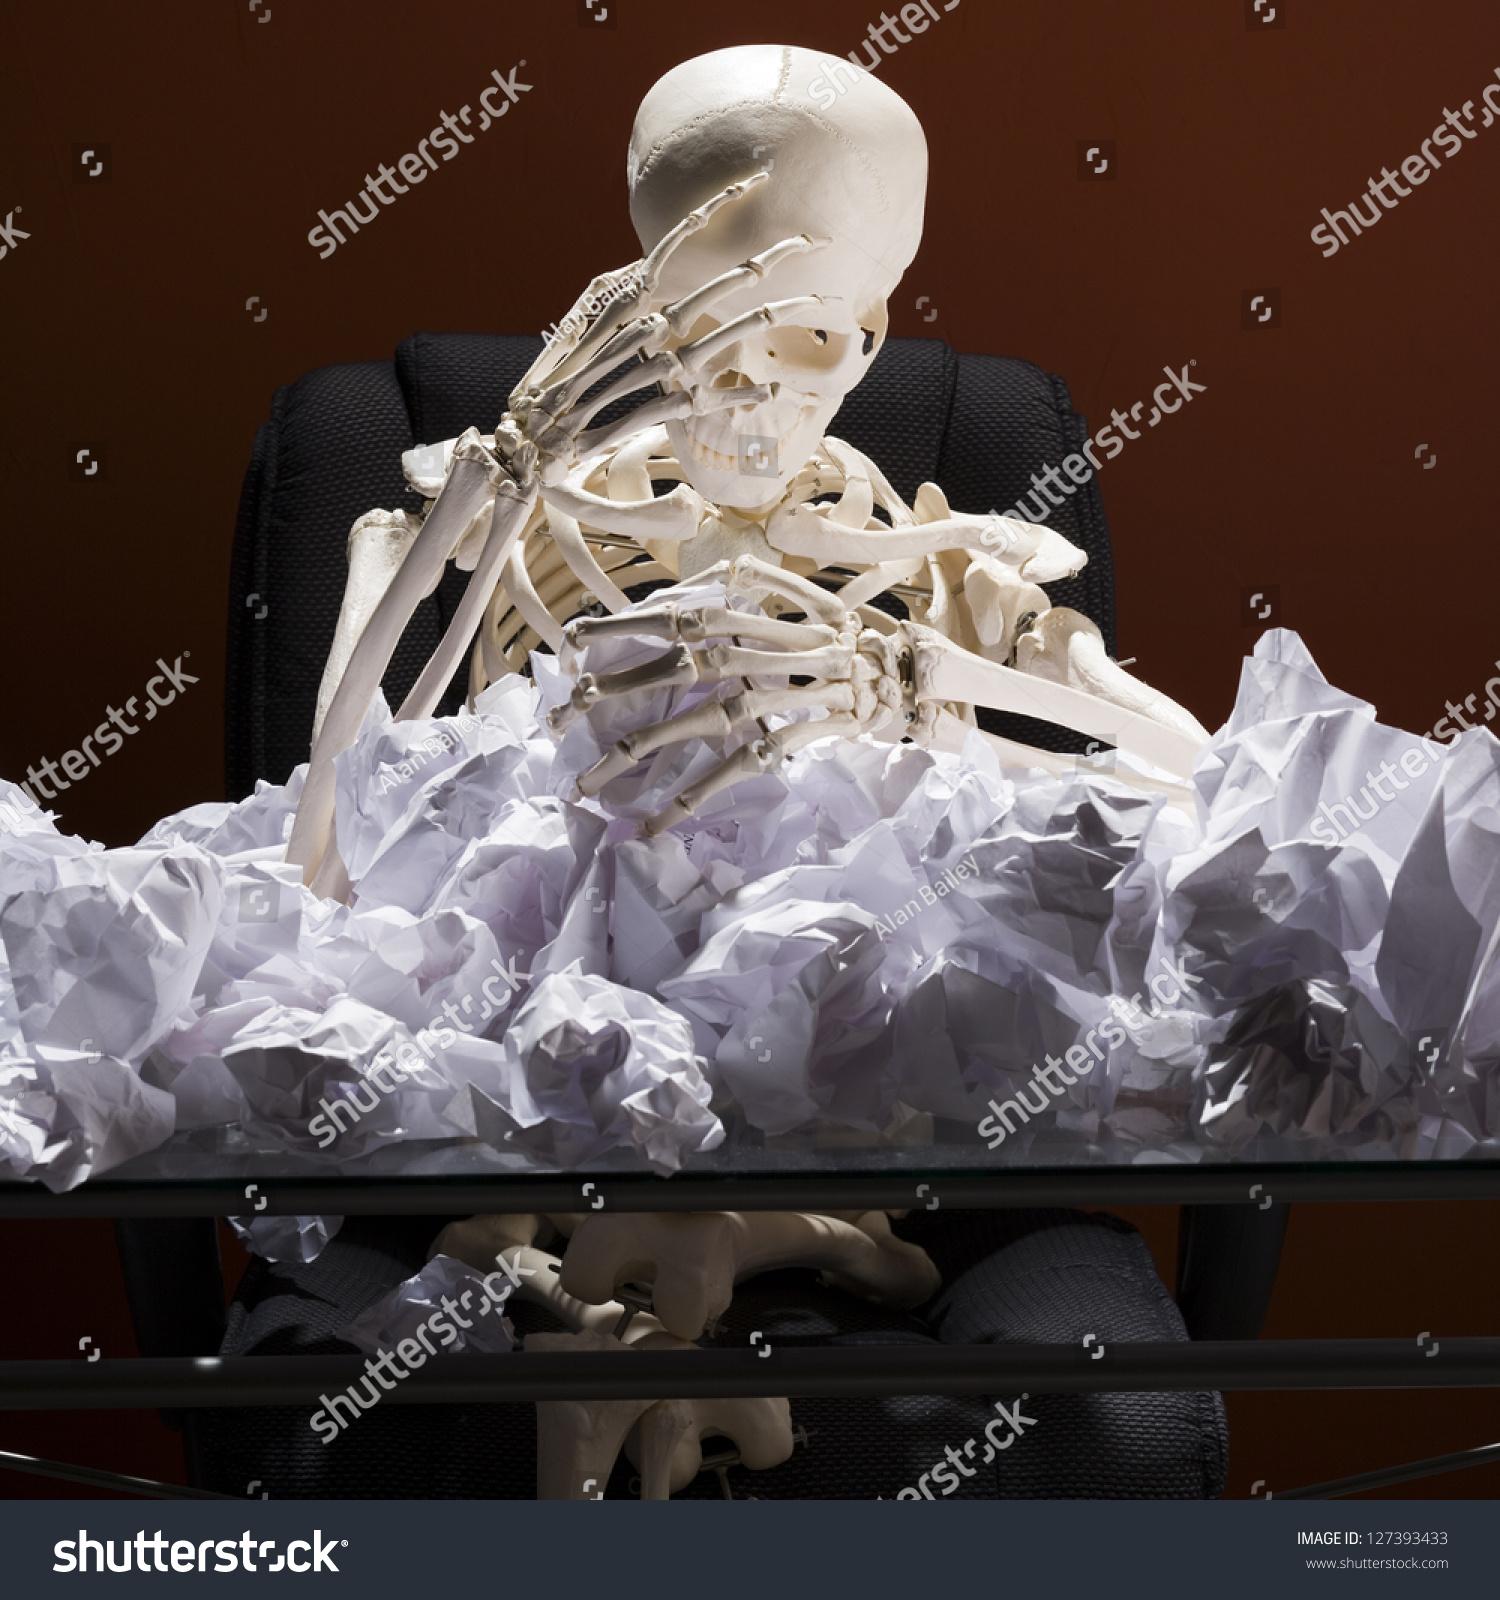 wake me up inside skeleton chair meme colourful office chairs uk at desk hostgarcia